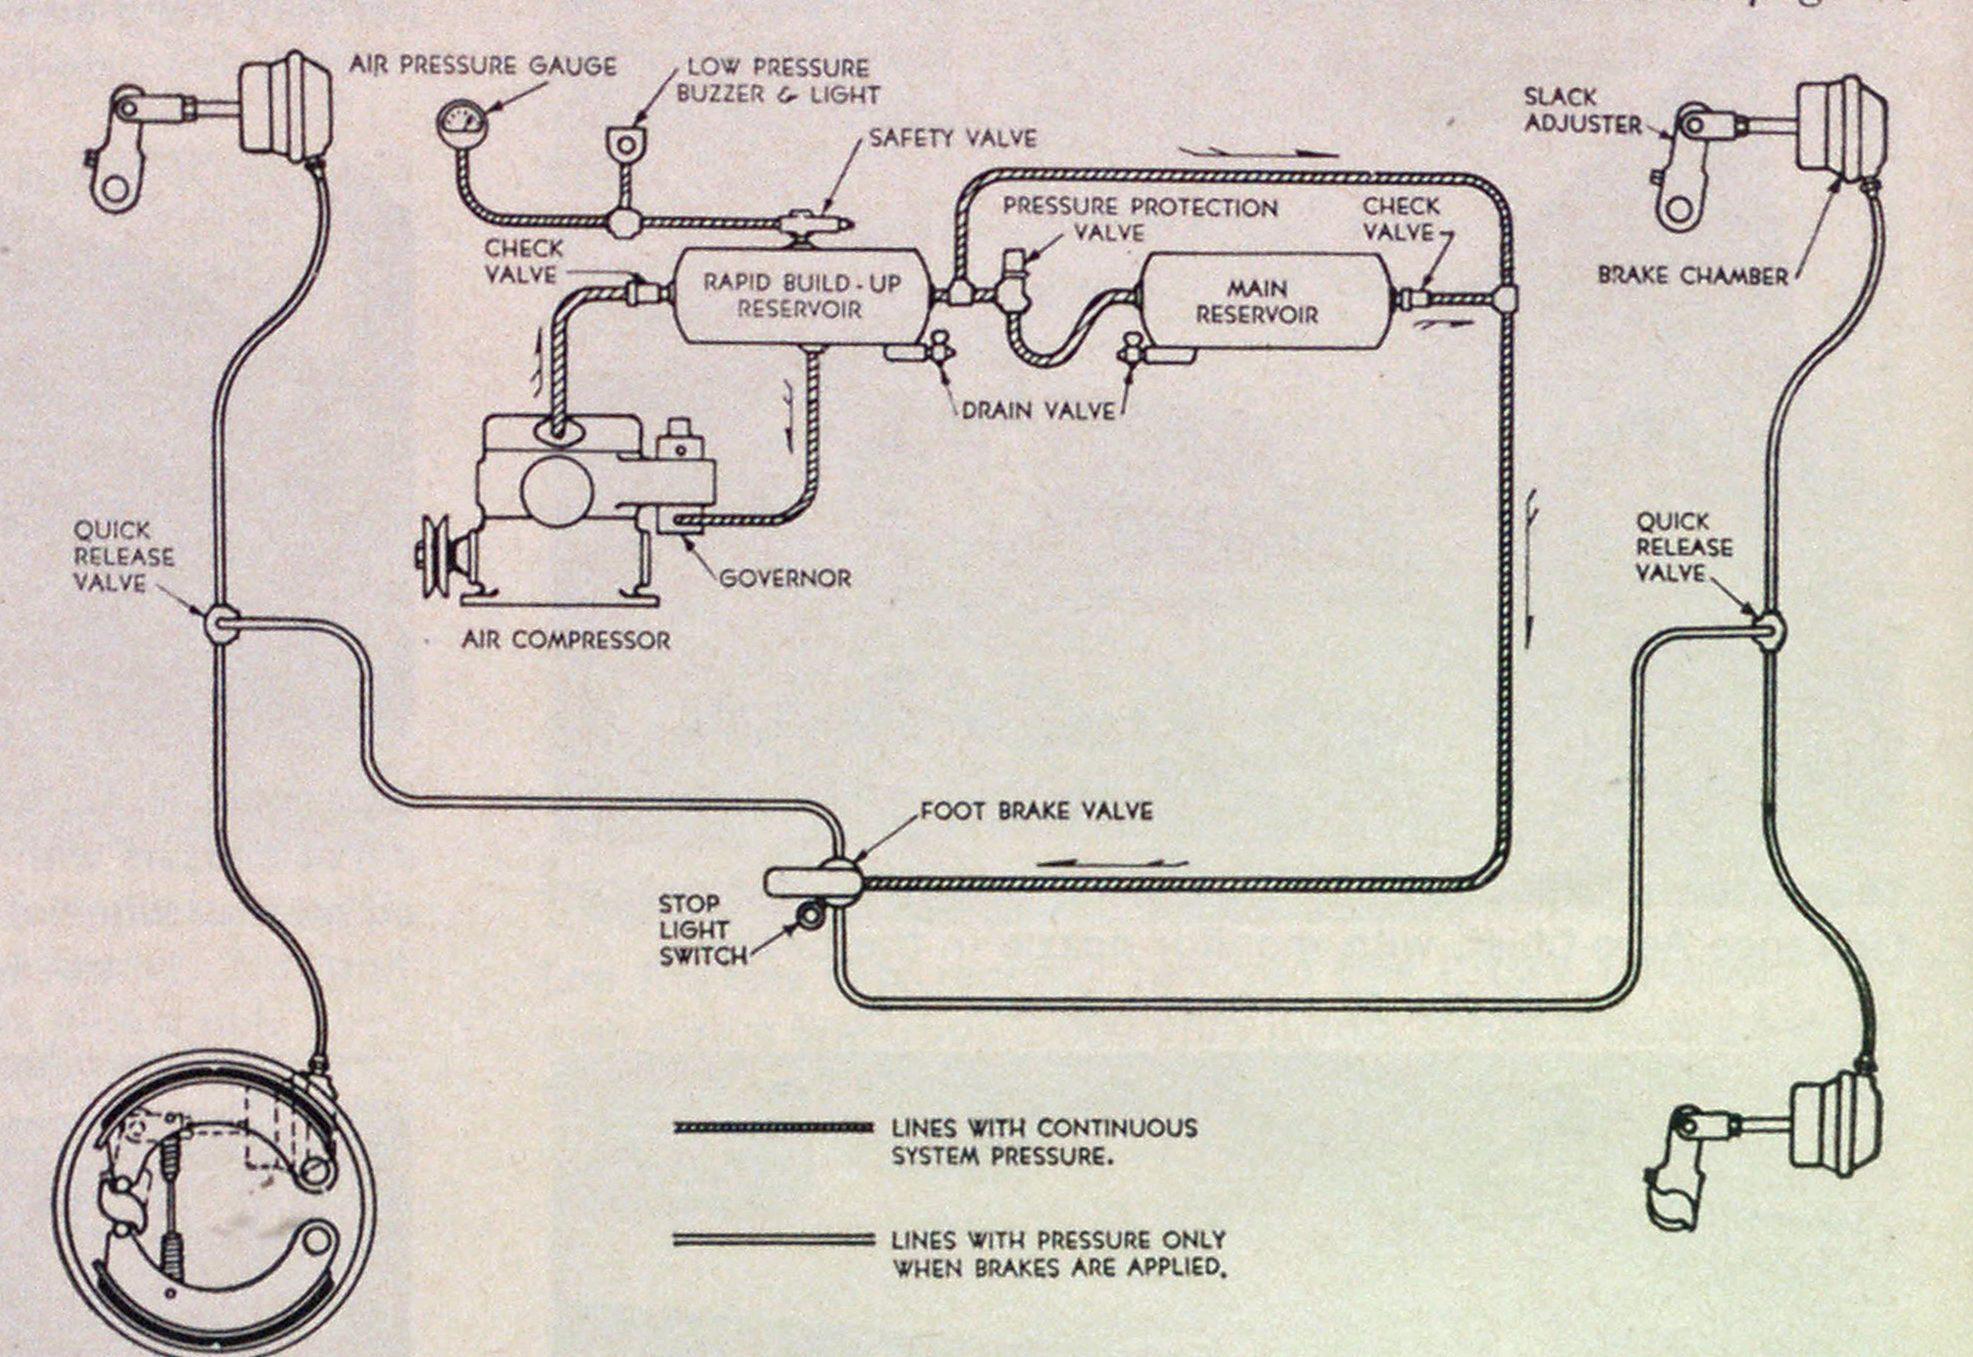 Air Brake Foot Valve Diagram Care Of Air Brakes Requires Understanding Of System Fire Engineering